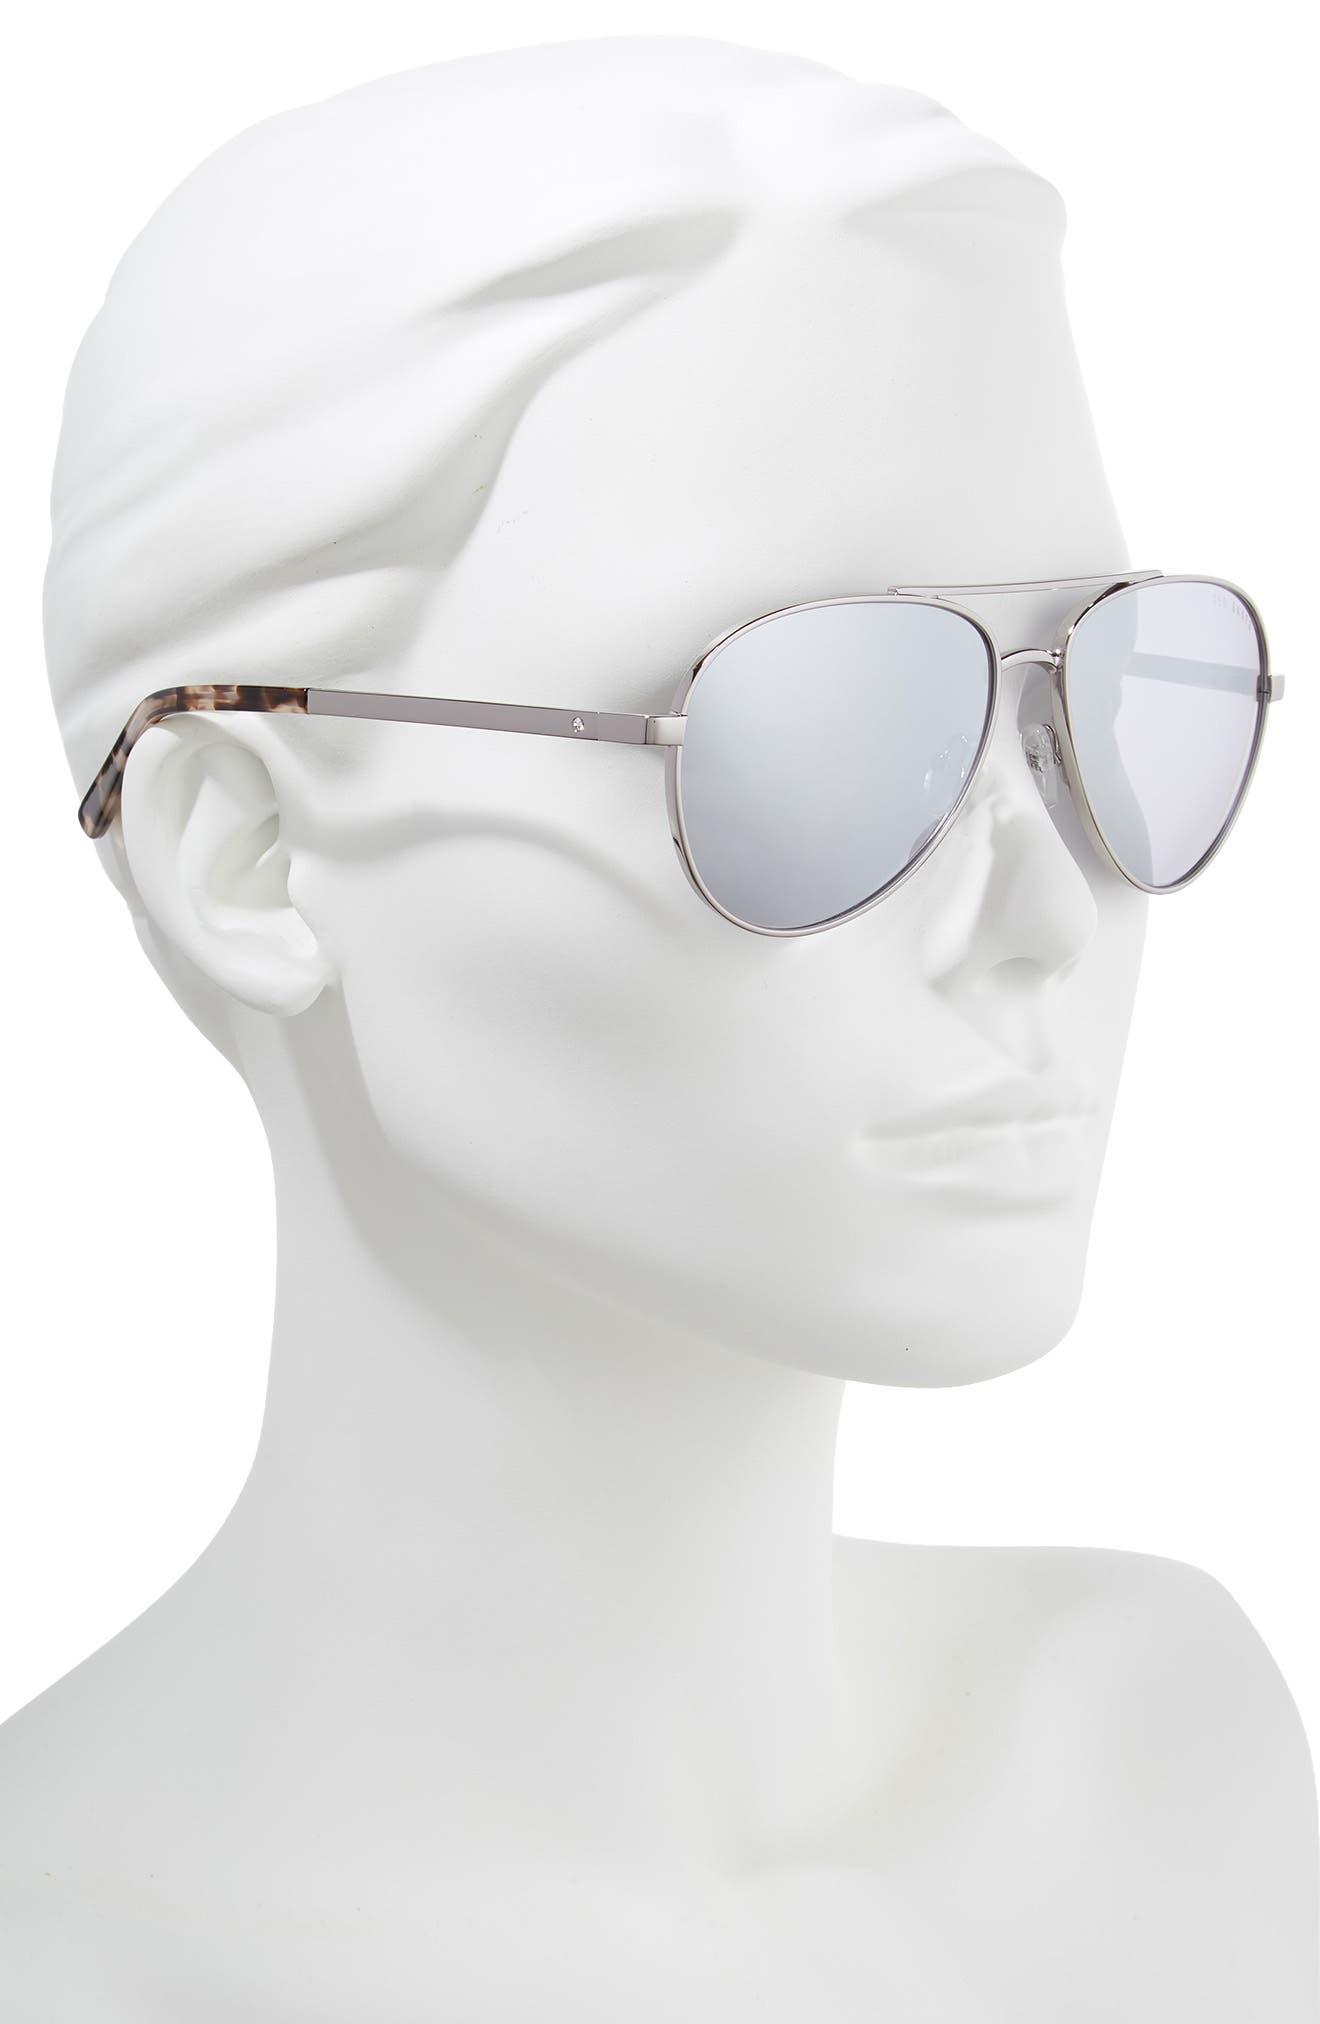 58mm Aviator Sunglasses,                             Alternate thumbnail 2, color,                             SILVER